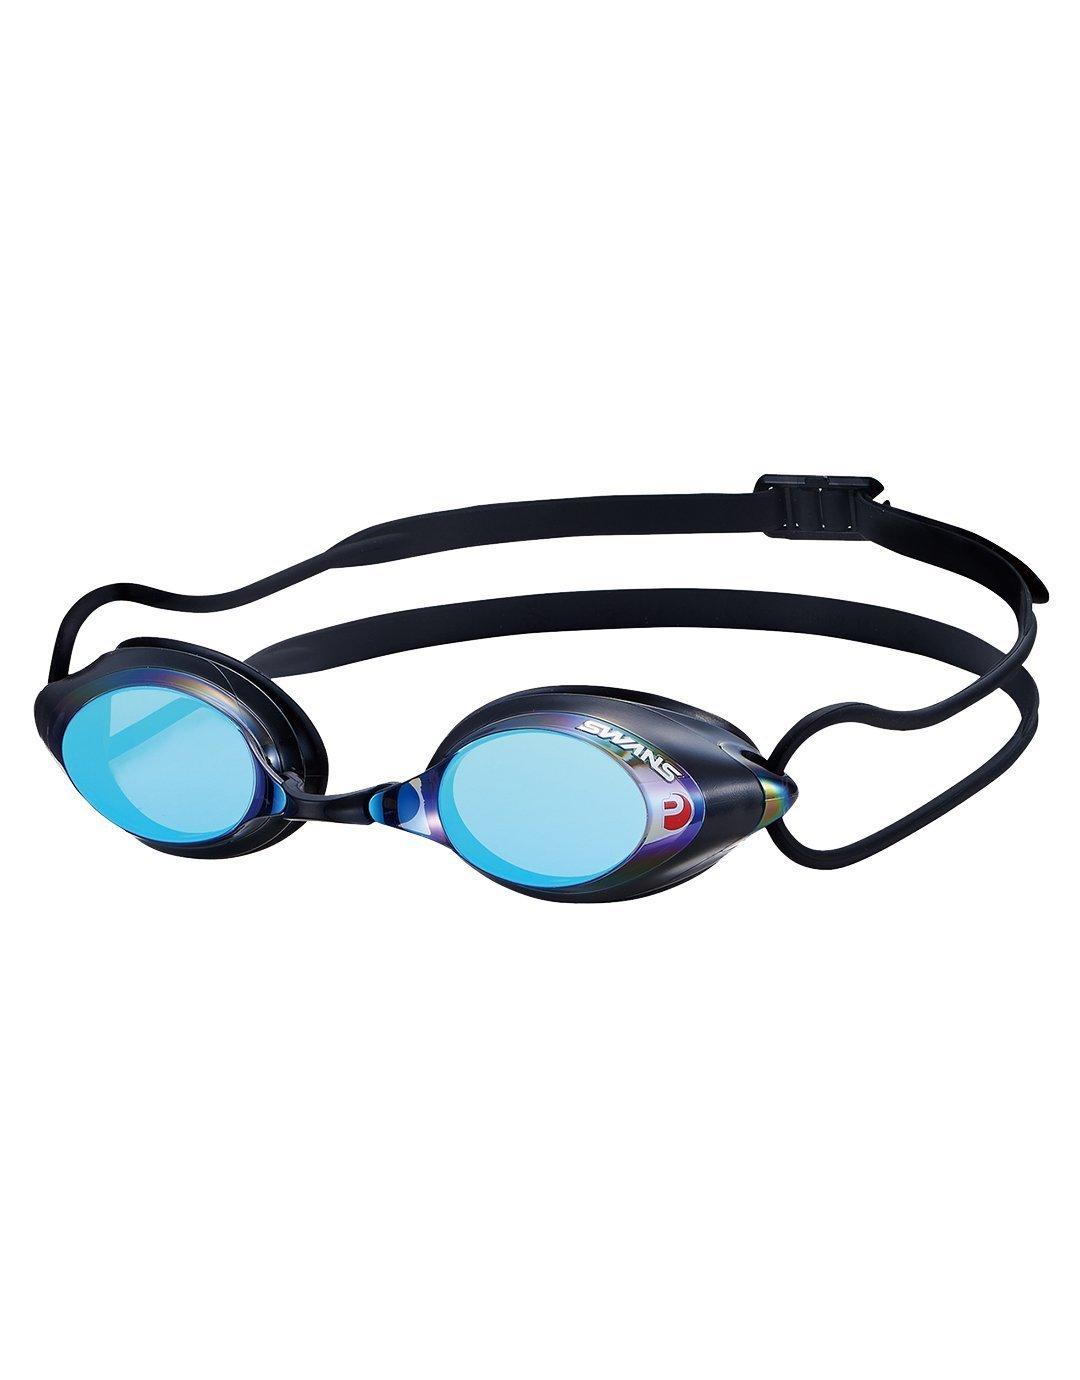 0be6b79910 SWANS Mirrored Professional Swimming Goggles SRX-M (Smoke Blue)   Amazon.co.uk  Sports   Outdoors